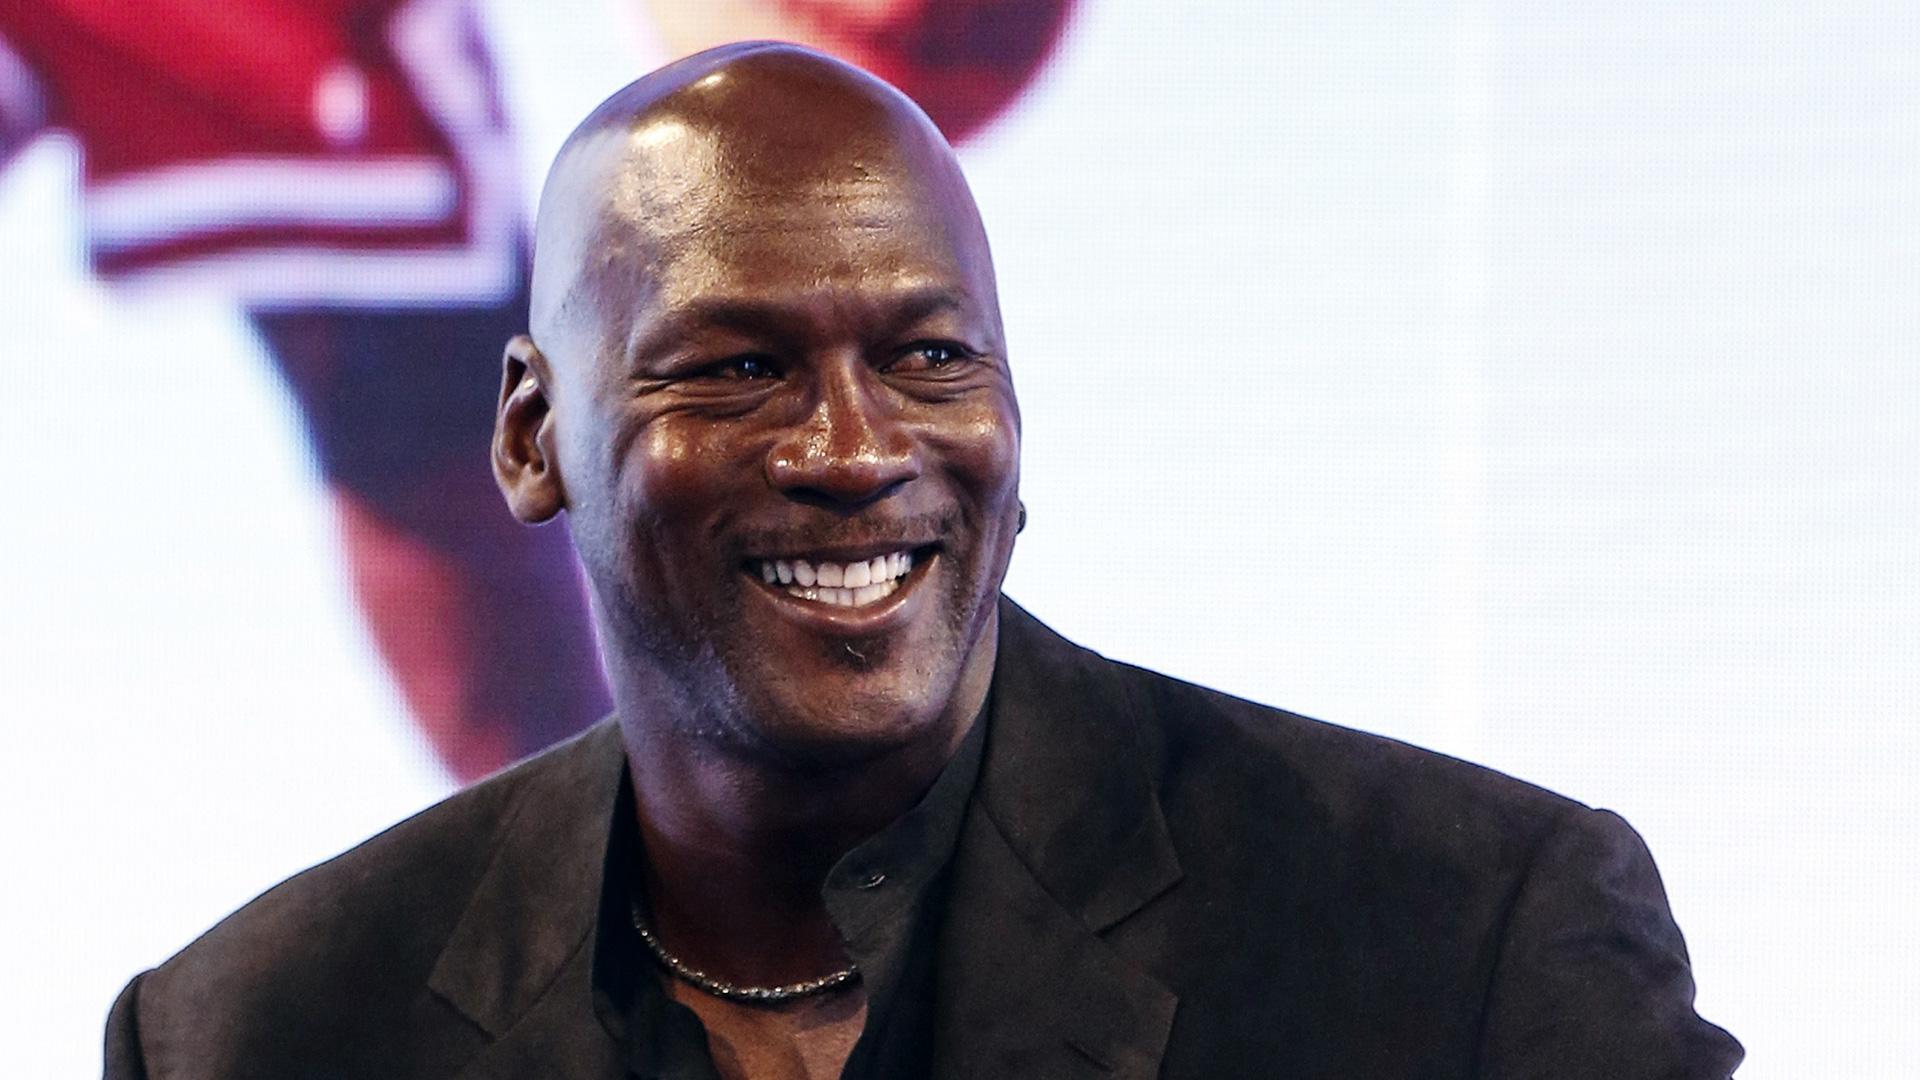 Pistons fans hate seeing Michael Jordan's Jumpman logo on Detroit uniforms